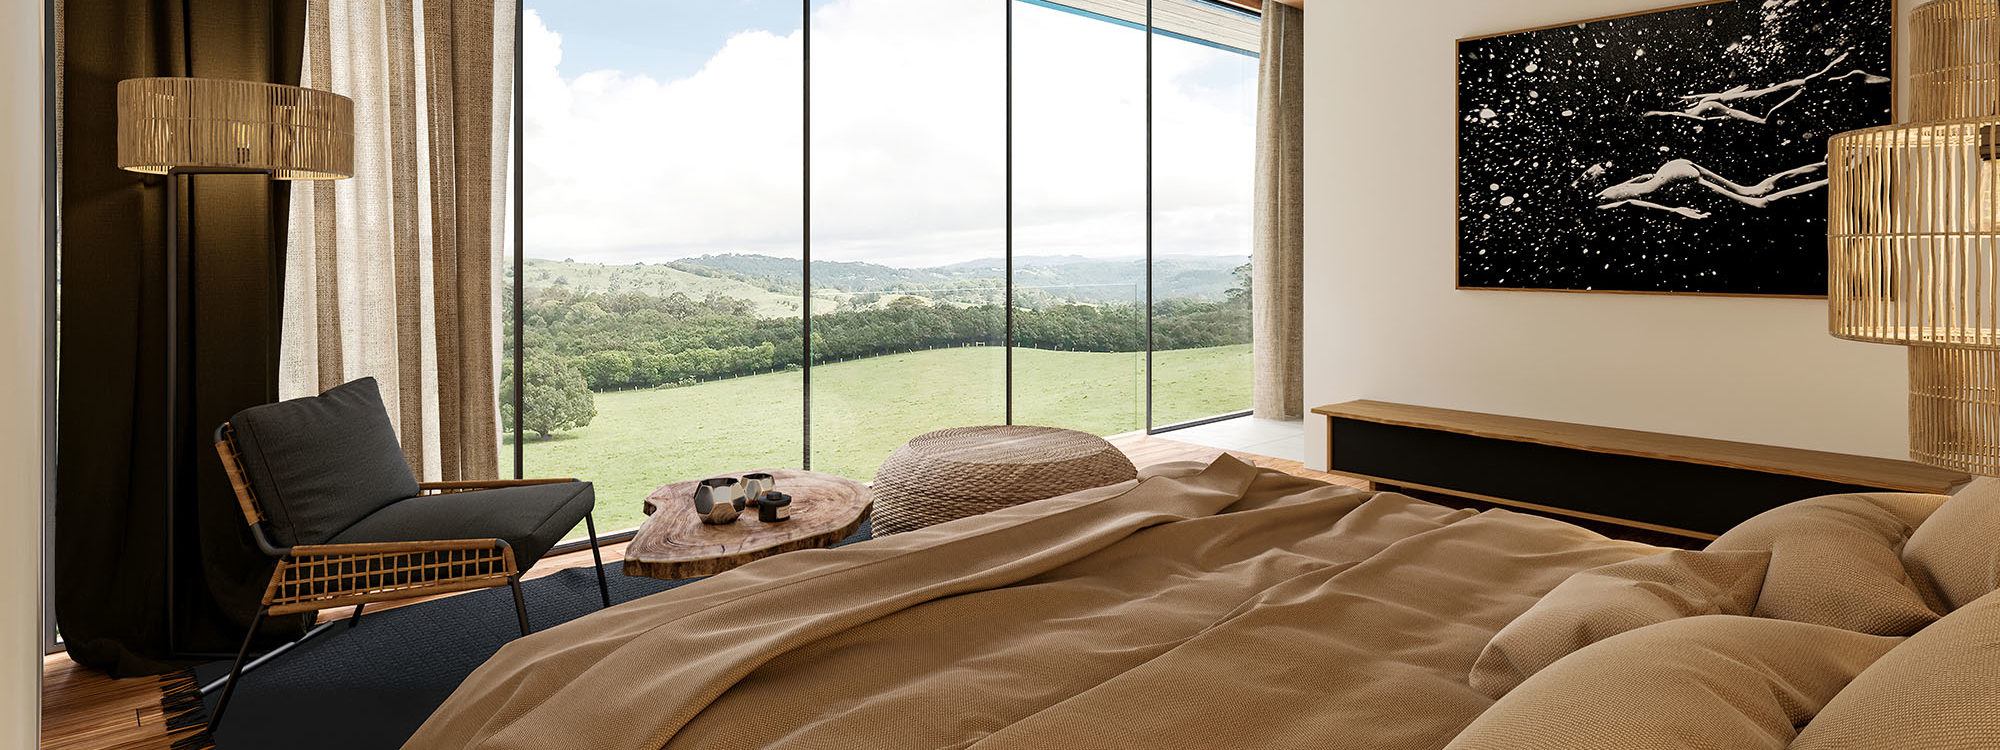 Soma - Byron Bay - Artist Impression Bedroom.jpg